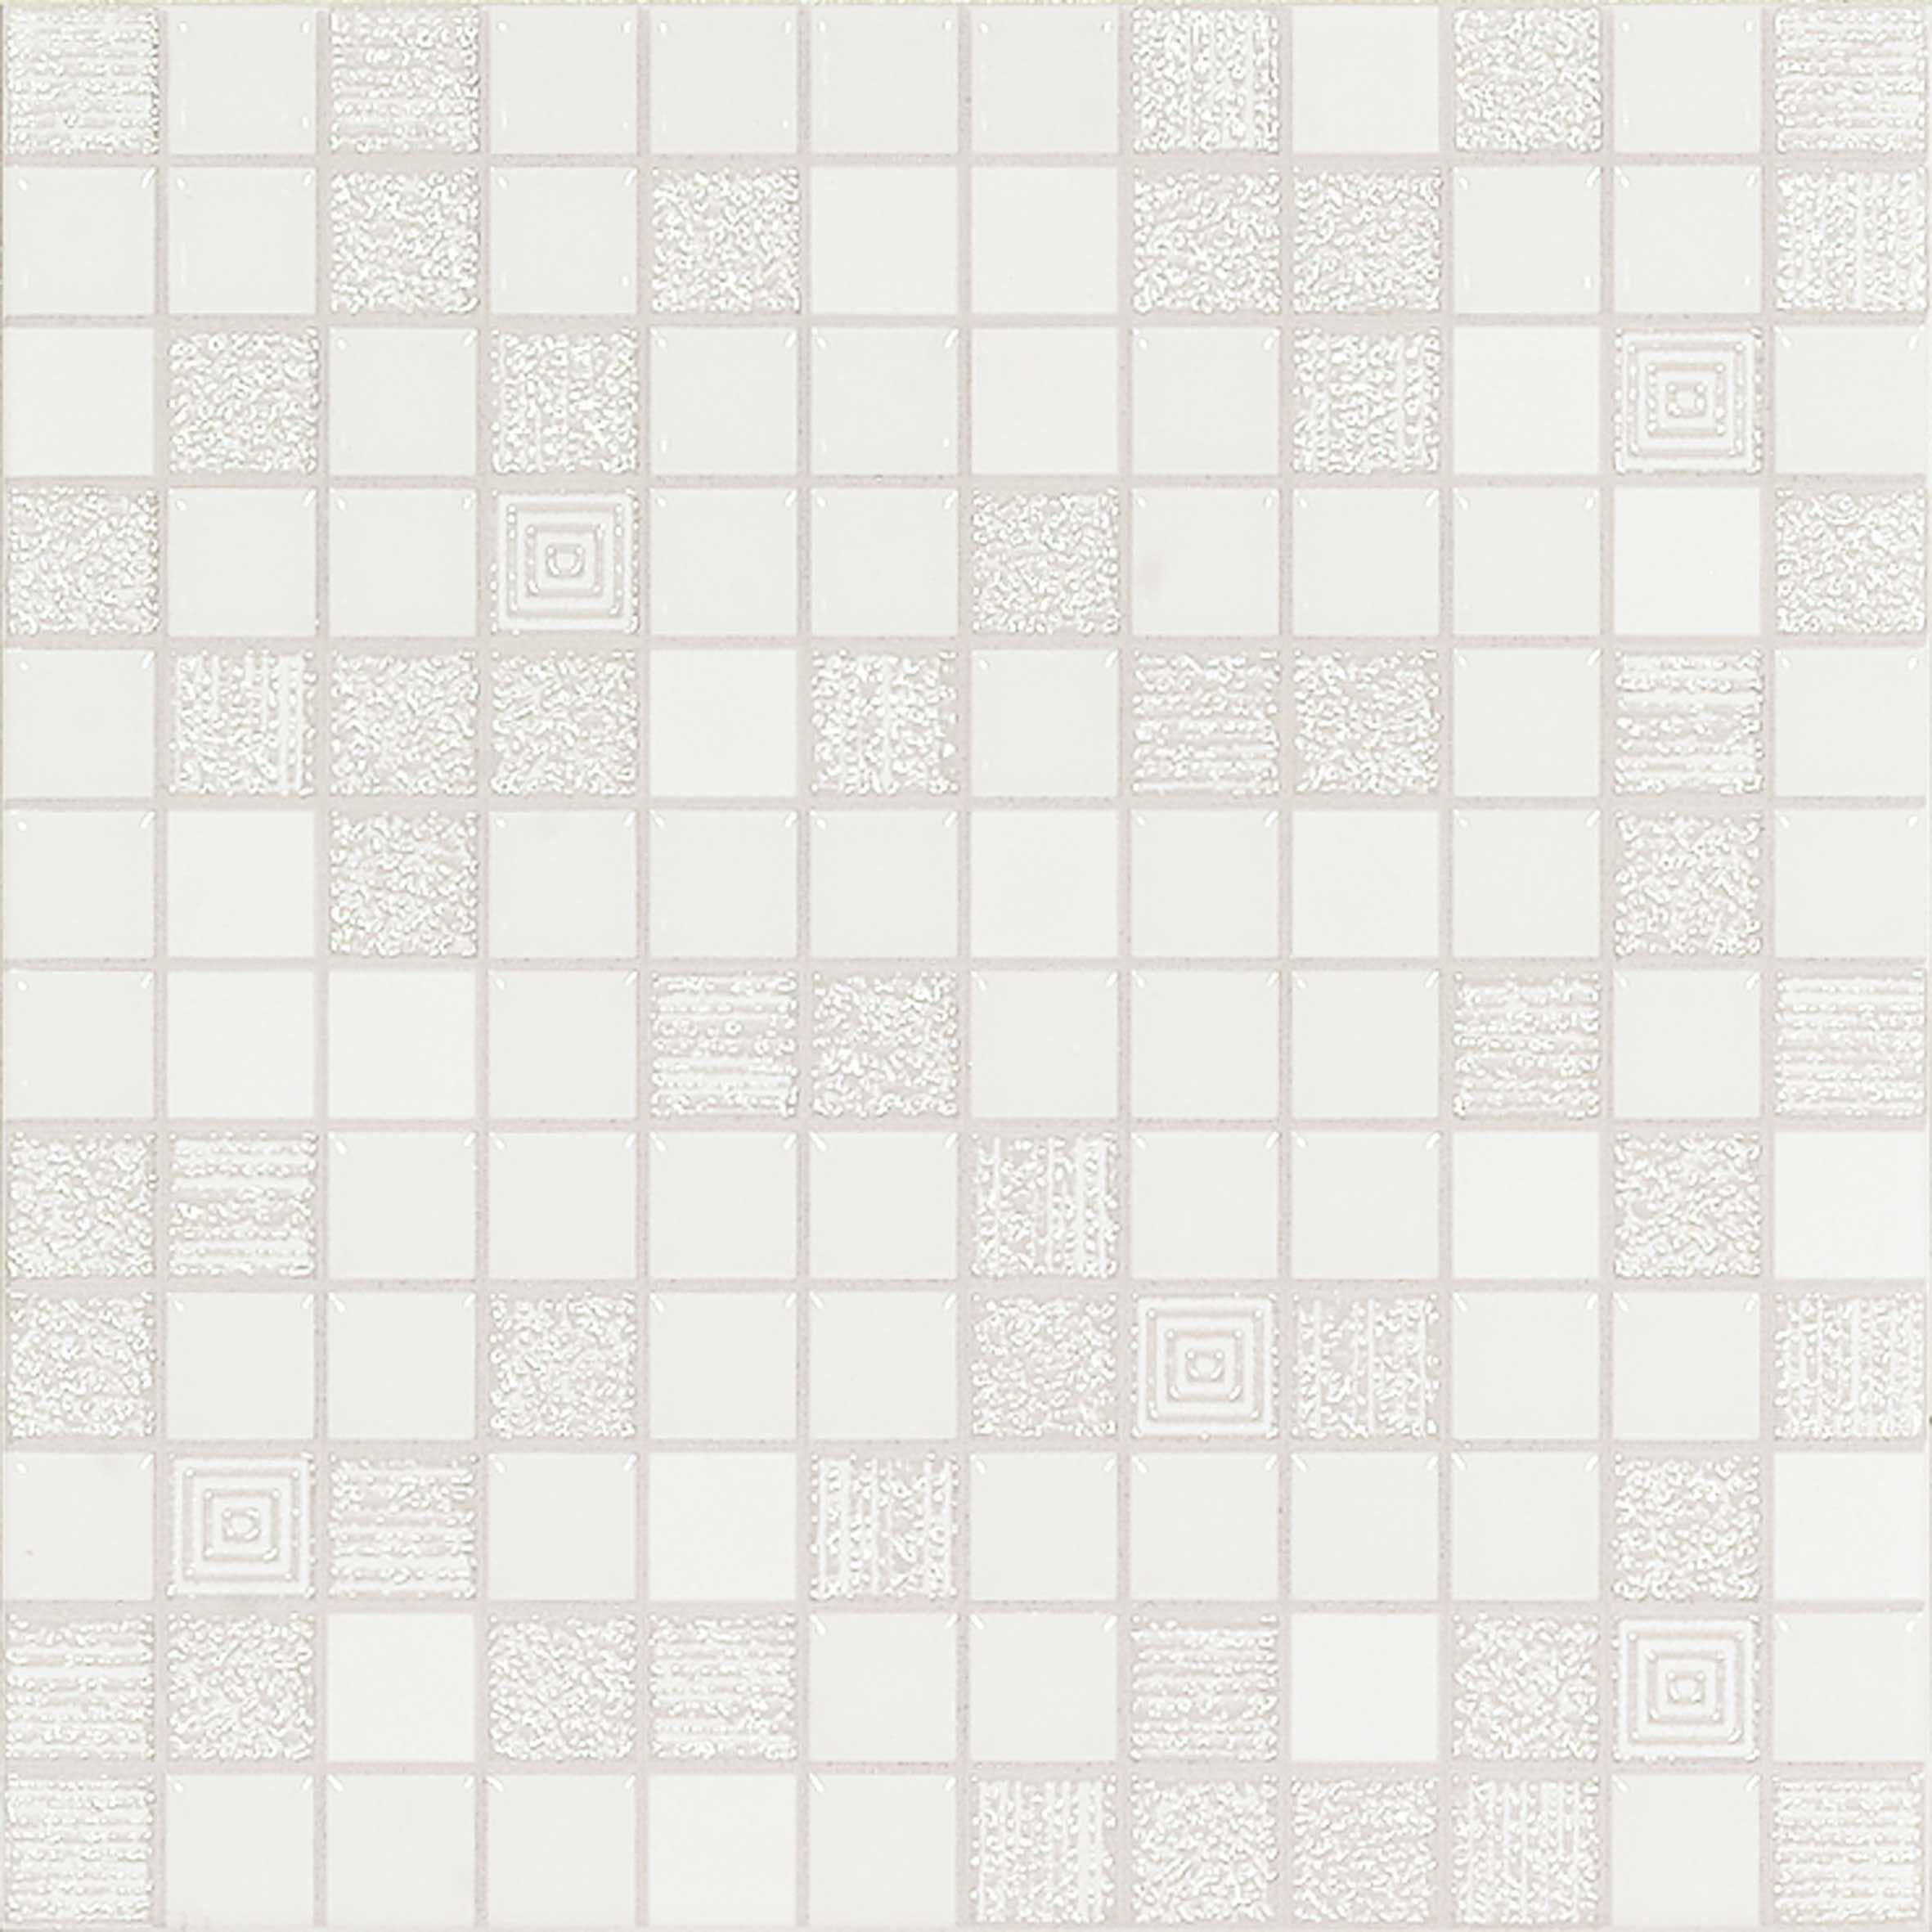 Azulejos ba o mosaico for Mosaico para bano precios